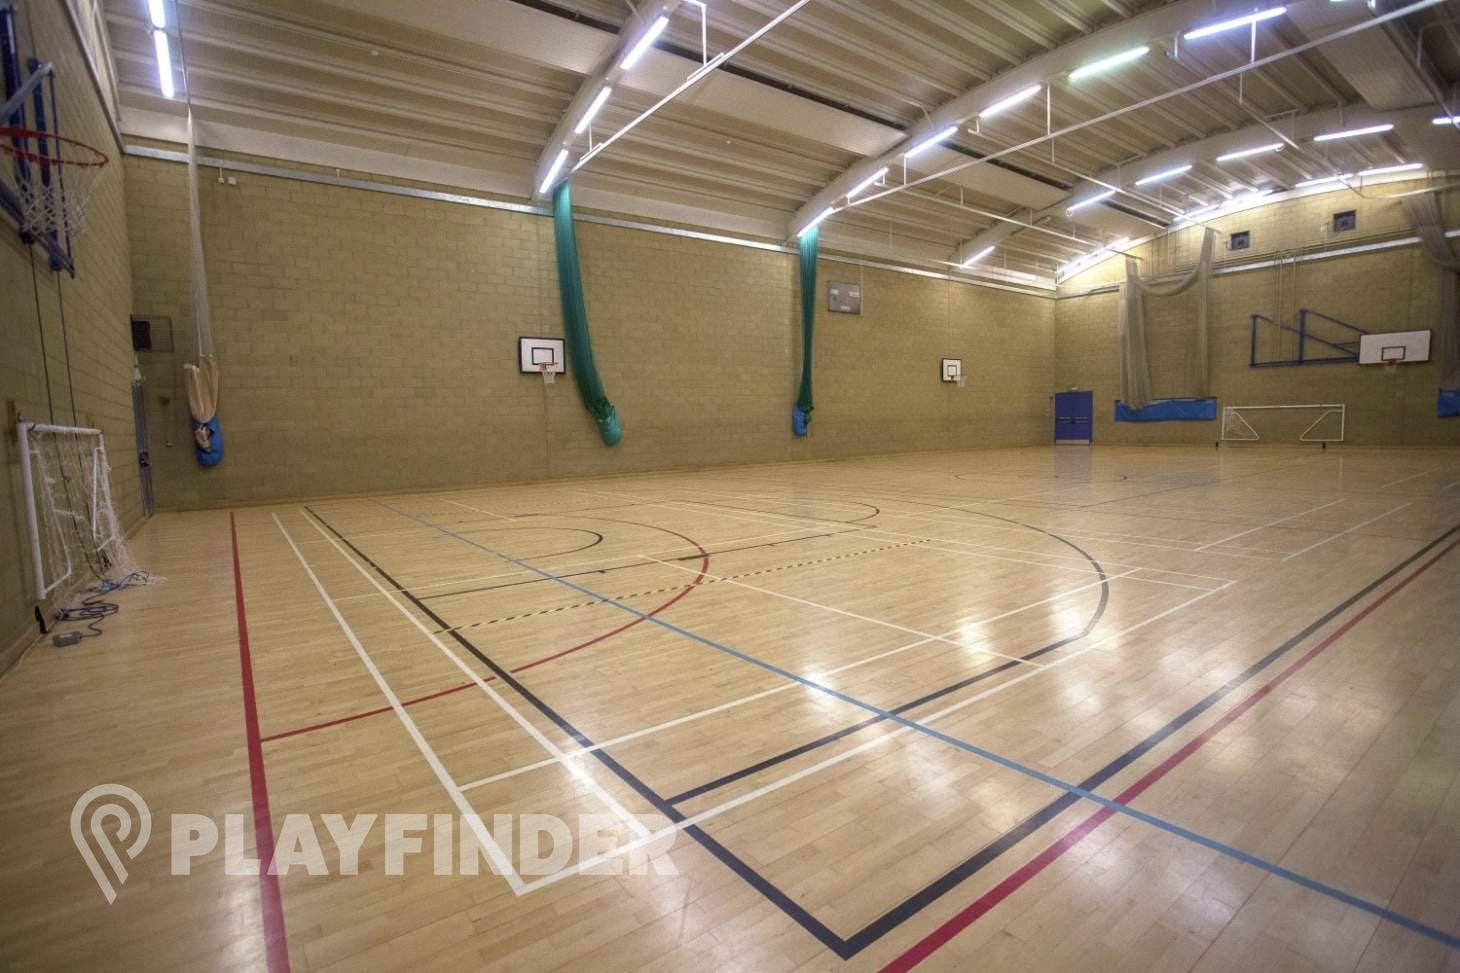 Royal Holloway University Sports Centre Indoor   Hard badminton court